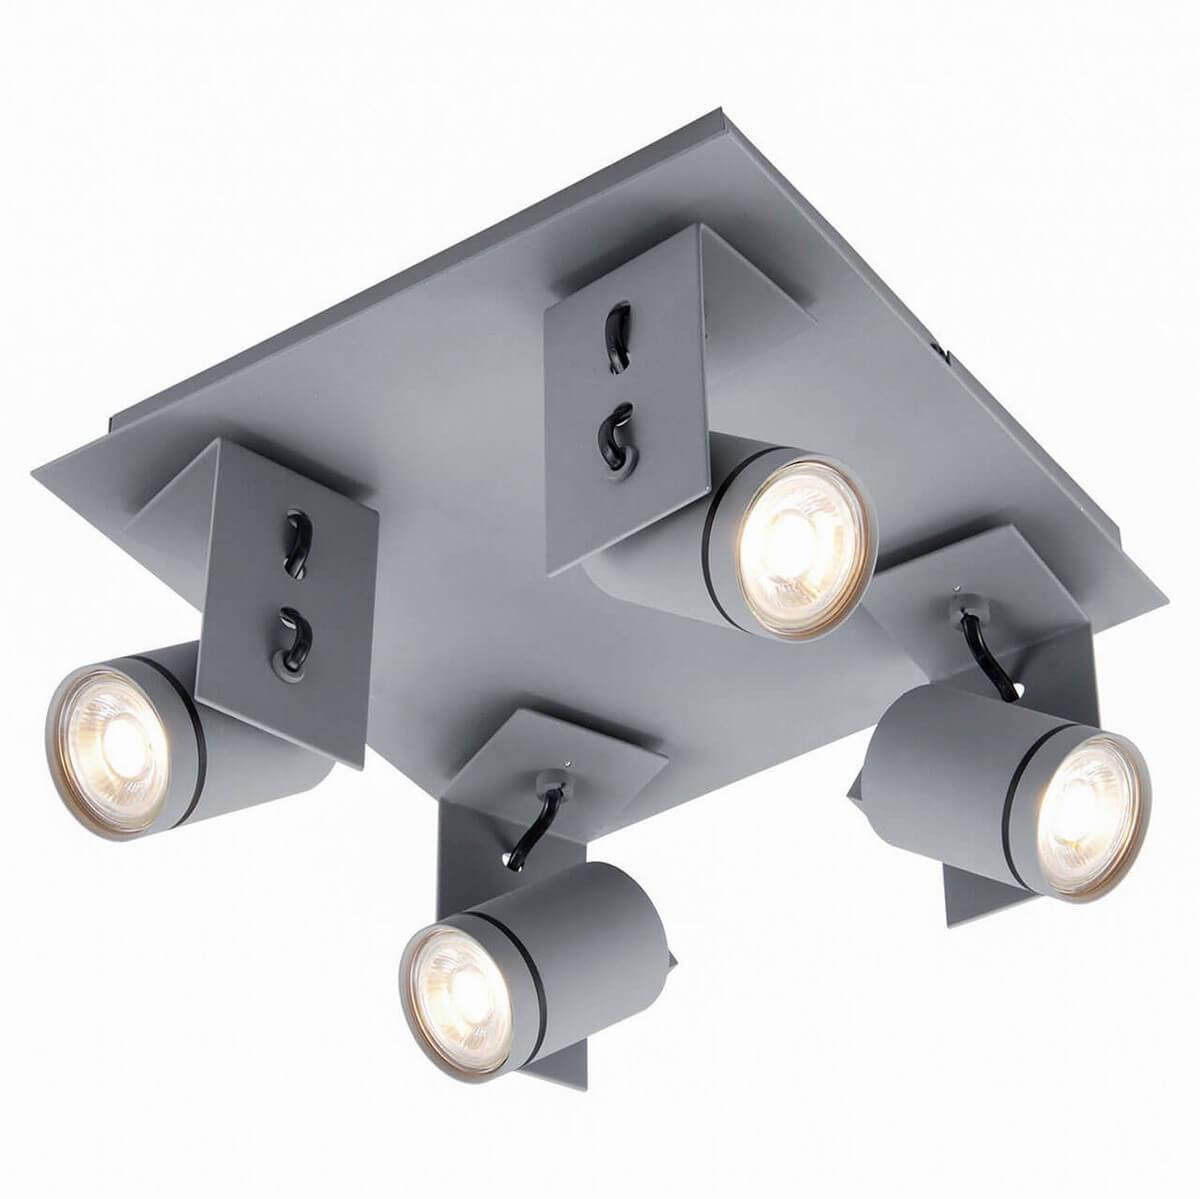 Спот Lussole Loft LSP-8024 ideal 8024